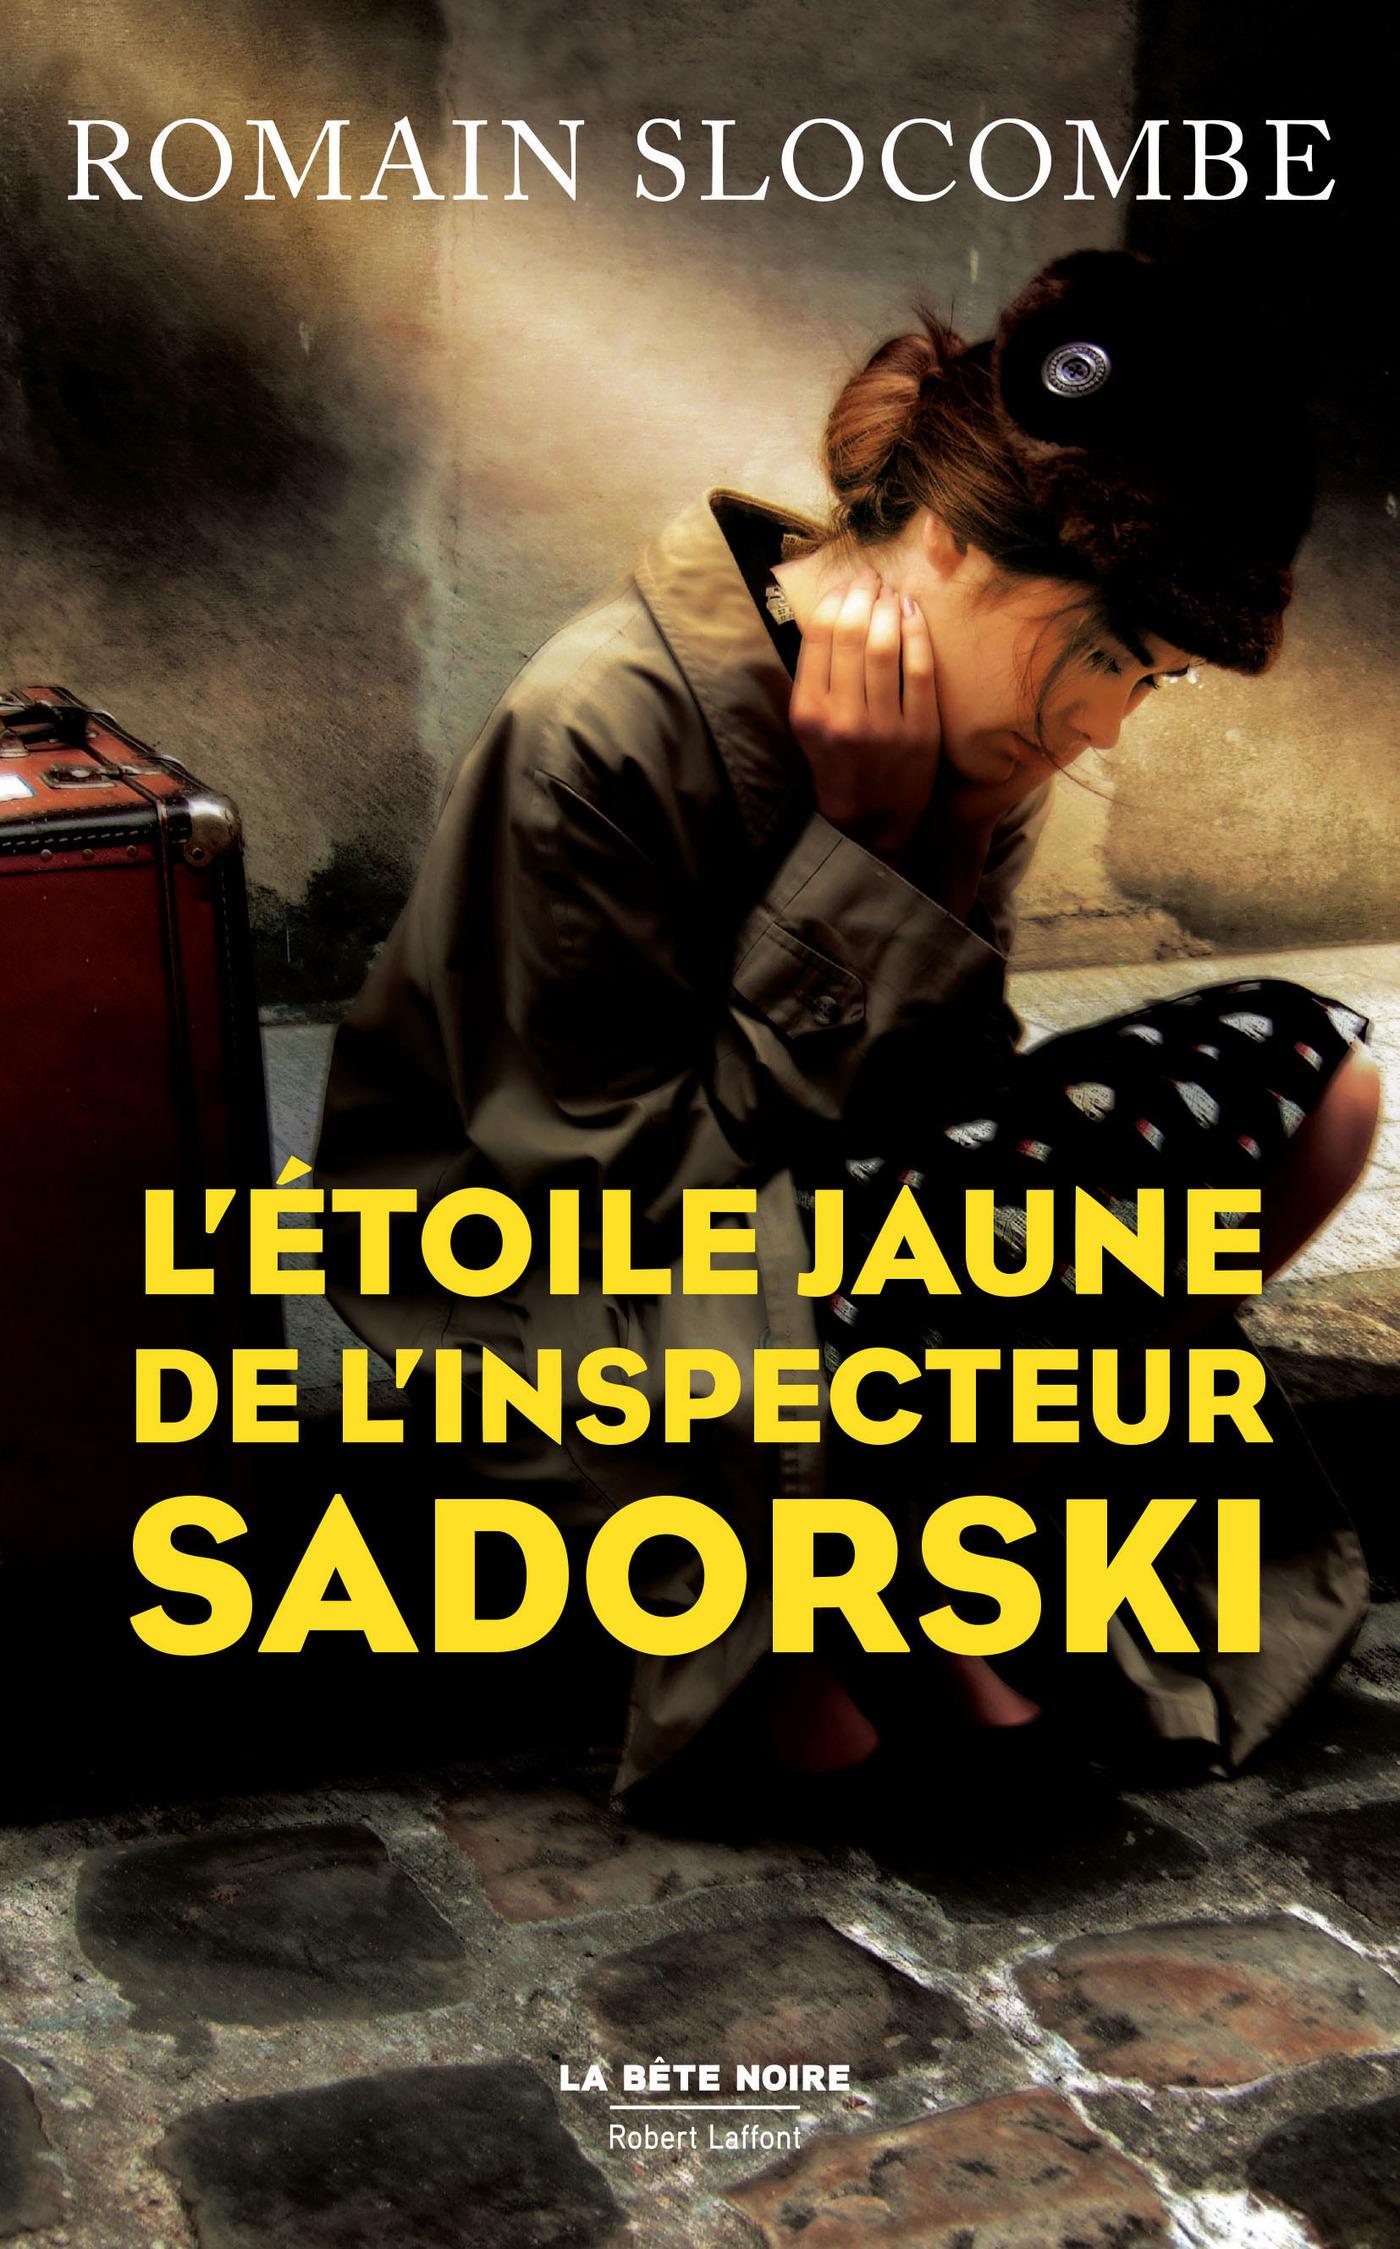 L'?toile jaune de l'inspecteur Sadorski